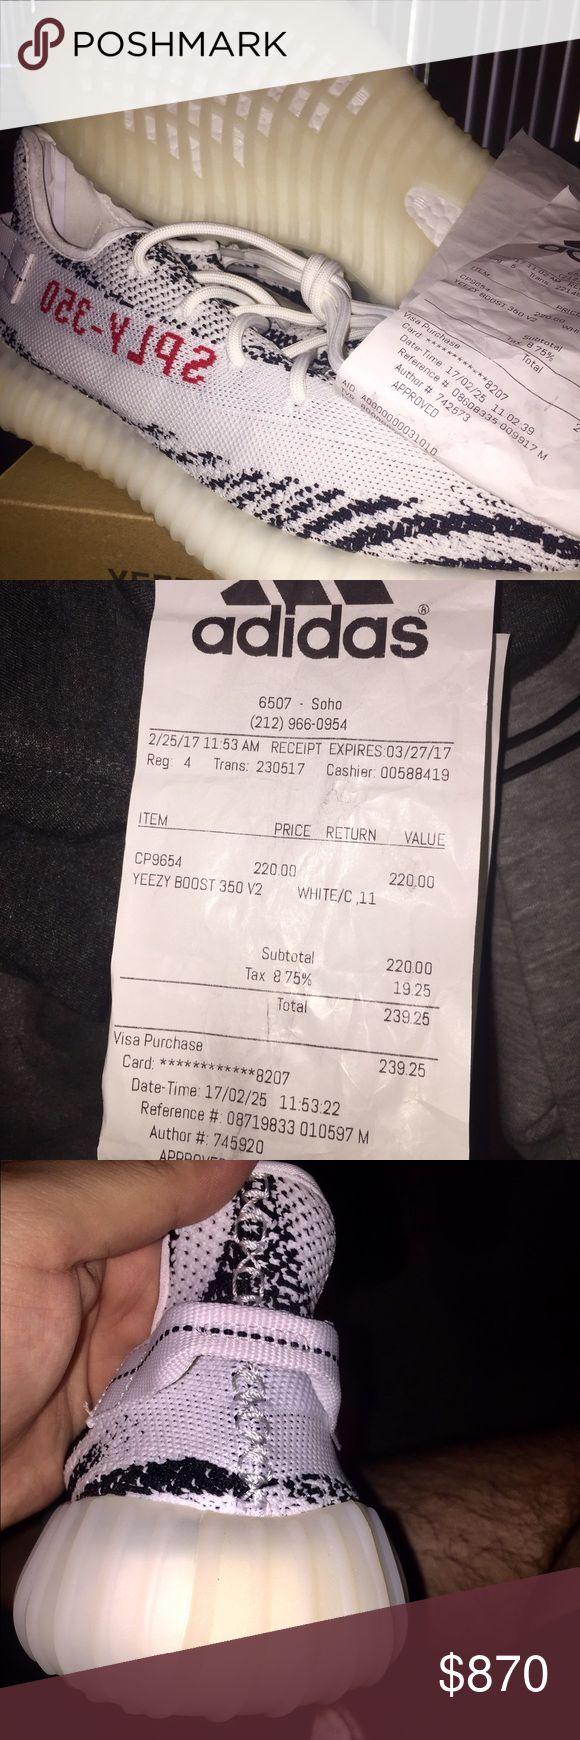 adidas shoes nmd women adidas yeezy v2 receipt